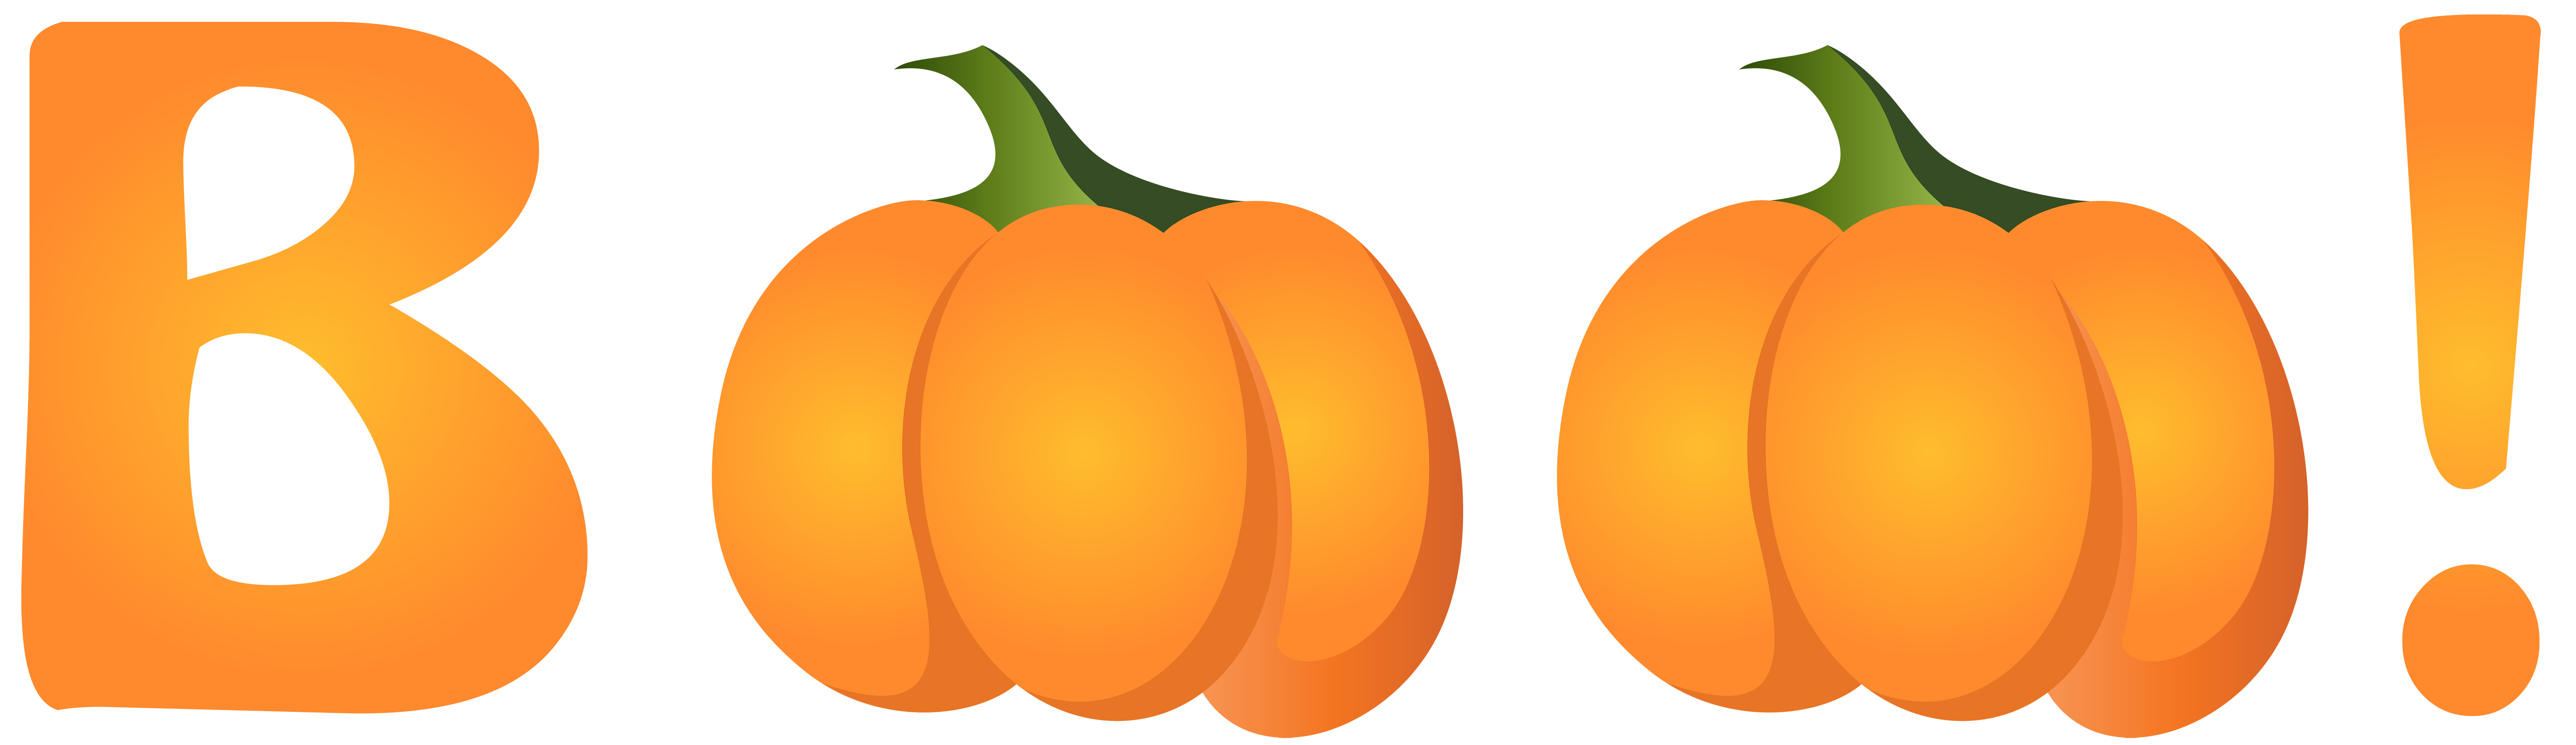 Halloween Boo PNG Clip Art Image.